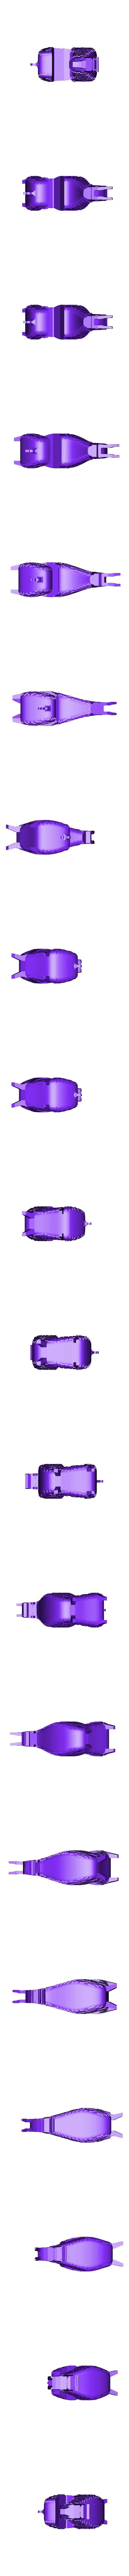 body.stl Download STL file Fortnite LLama • 3D print template, EliGreen